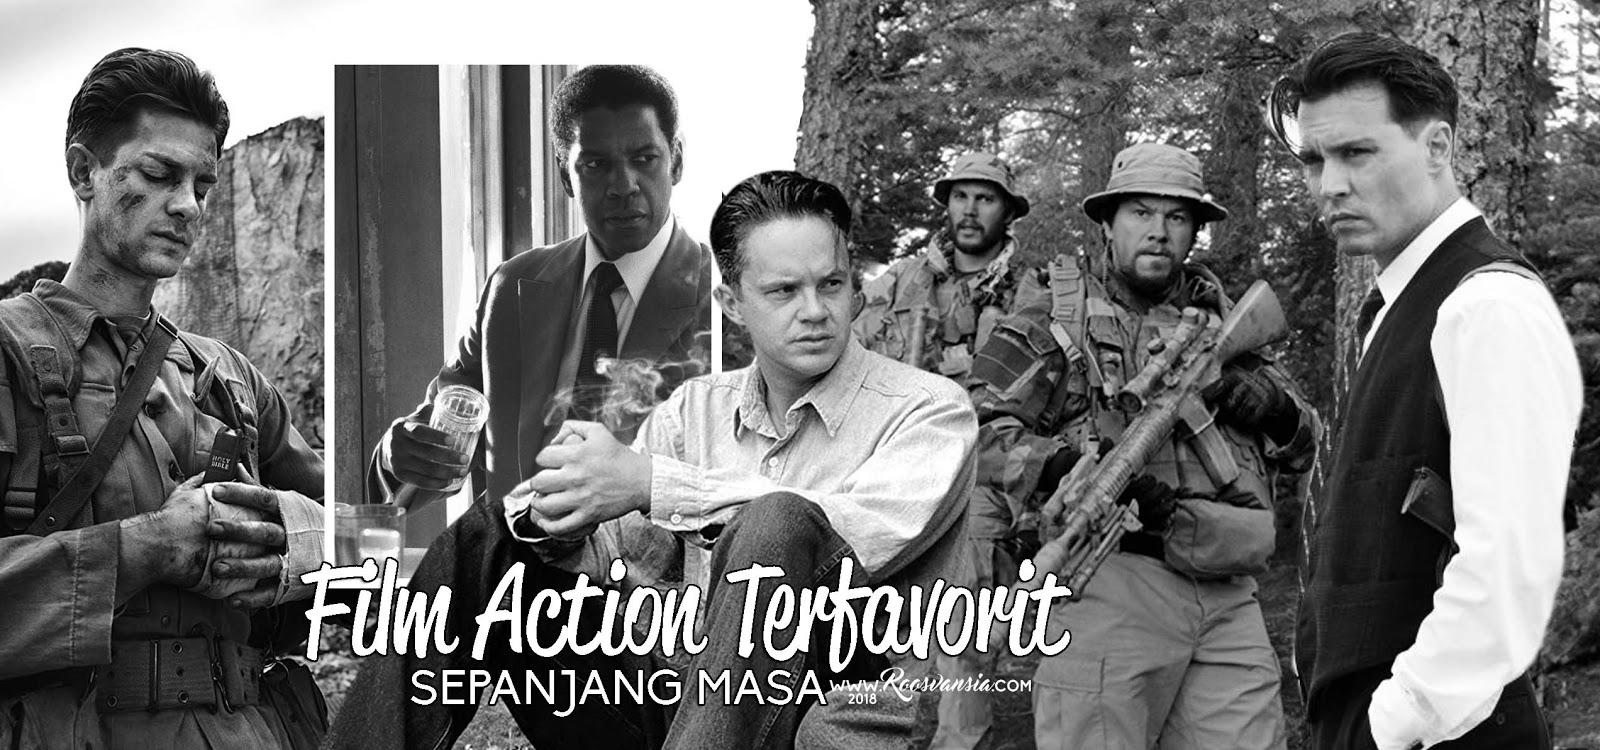 5 Film Action Terfavorit Sepanjang Masa - Roosvansia